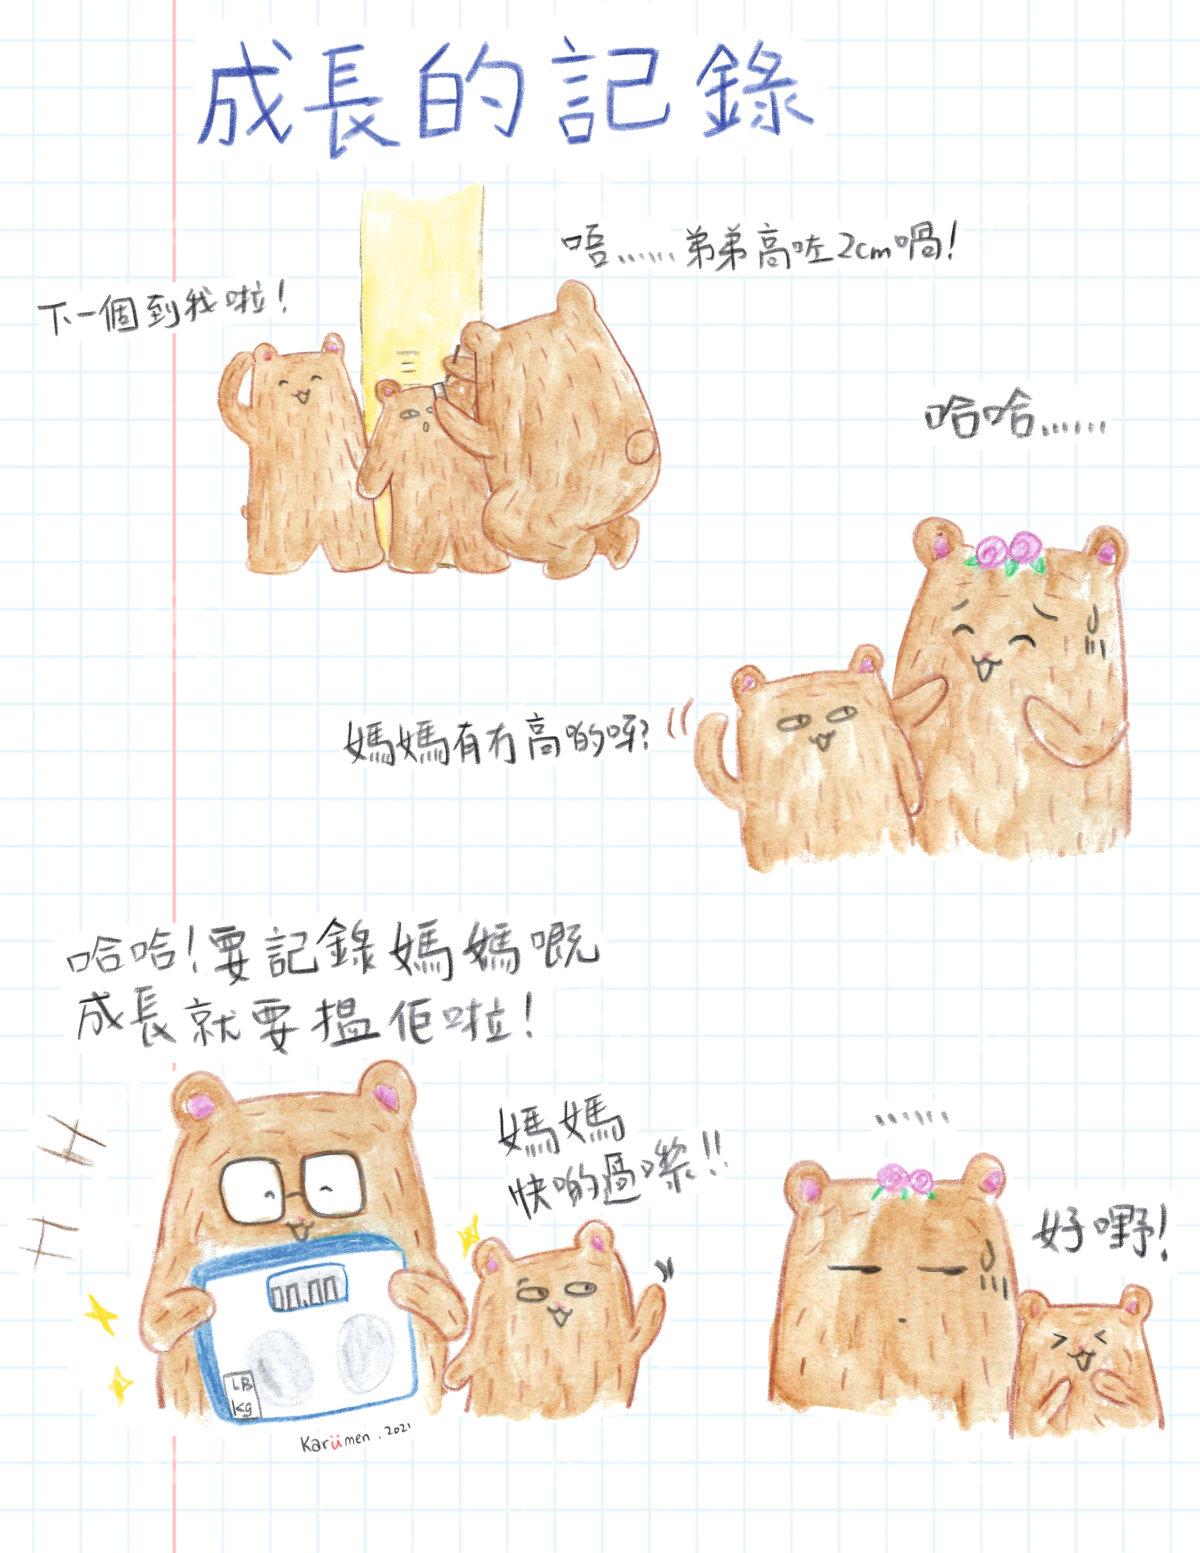 mingpao_12_carmenlee_v2